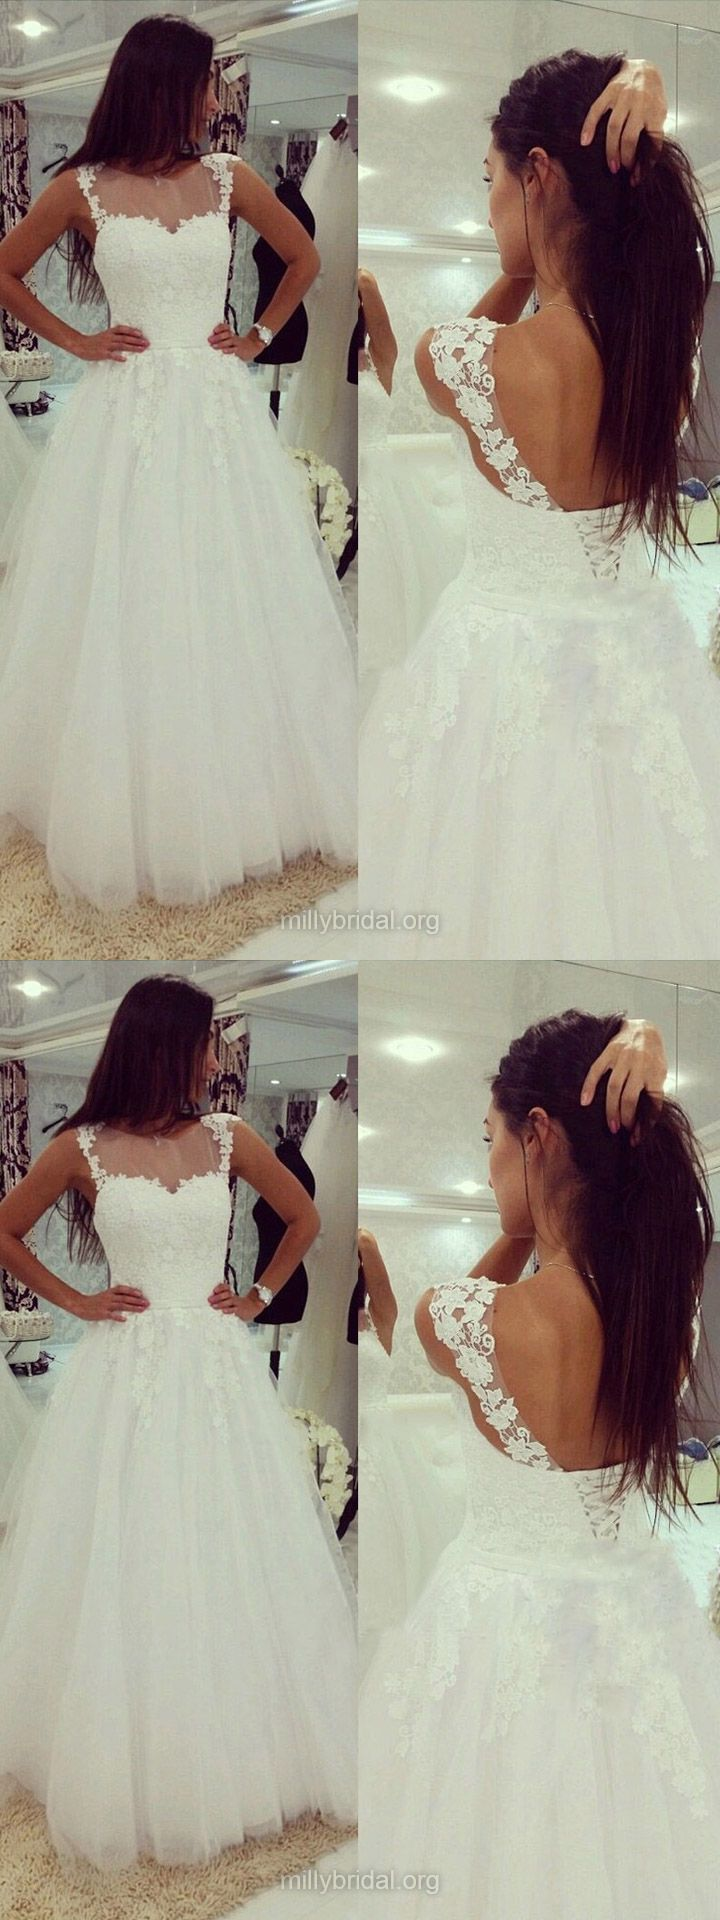 White Wedding Dresses Lace, A-line Wedding Dresses Scoop Neck, Cheap Bridal Gowns Tulle Appliques Modest